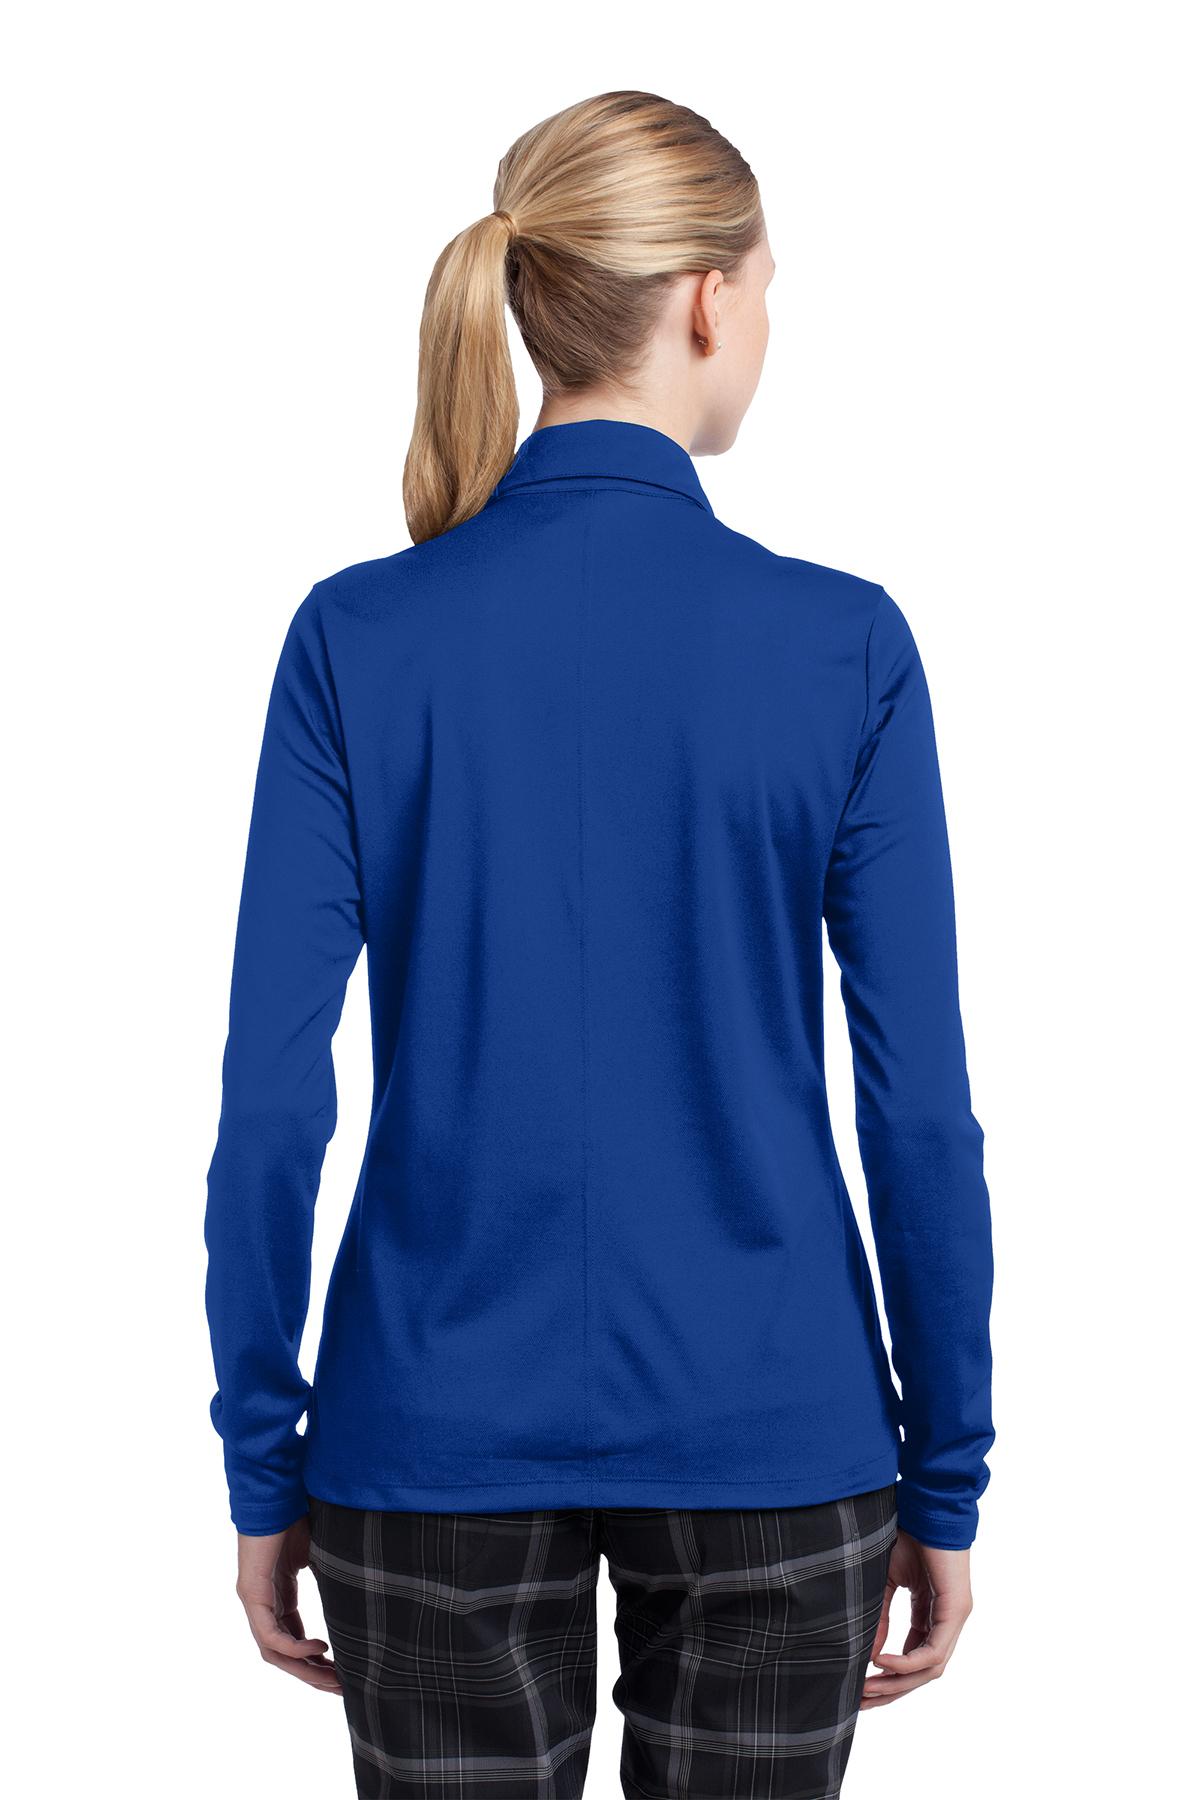 647a057a Nike Ladies Long Sleeve Dri-FIT Stretch Tech Polo   Ladies/Women ...